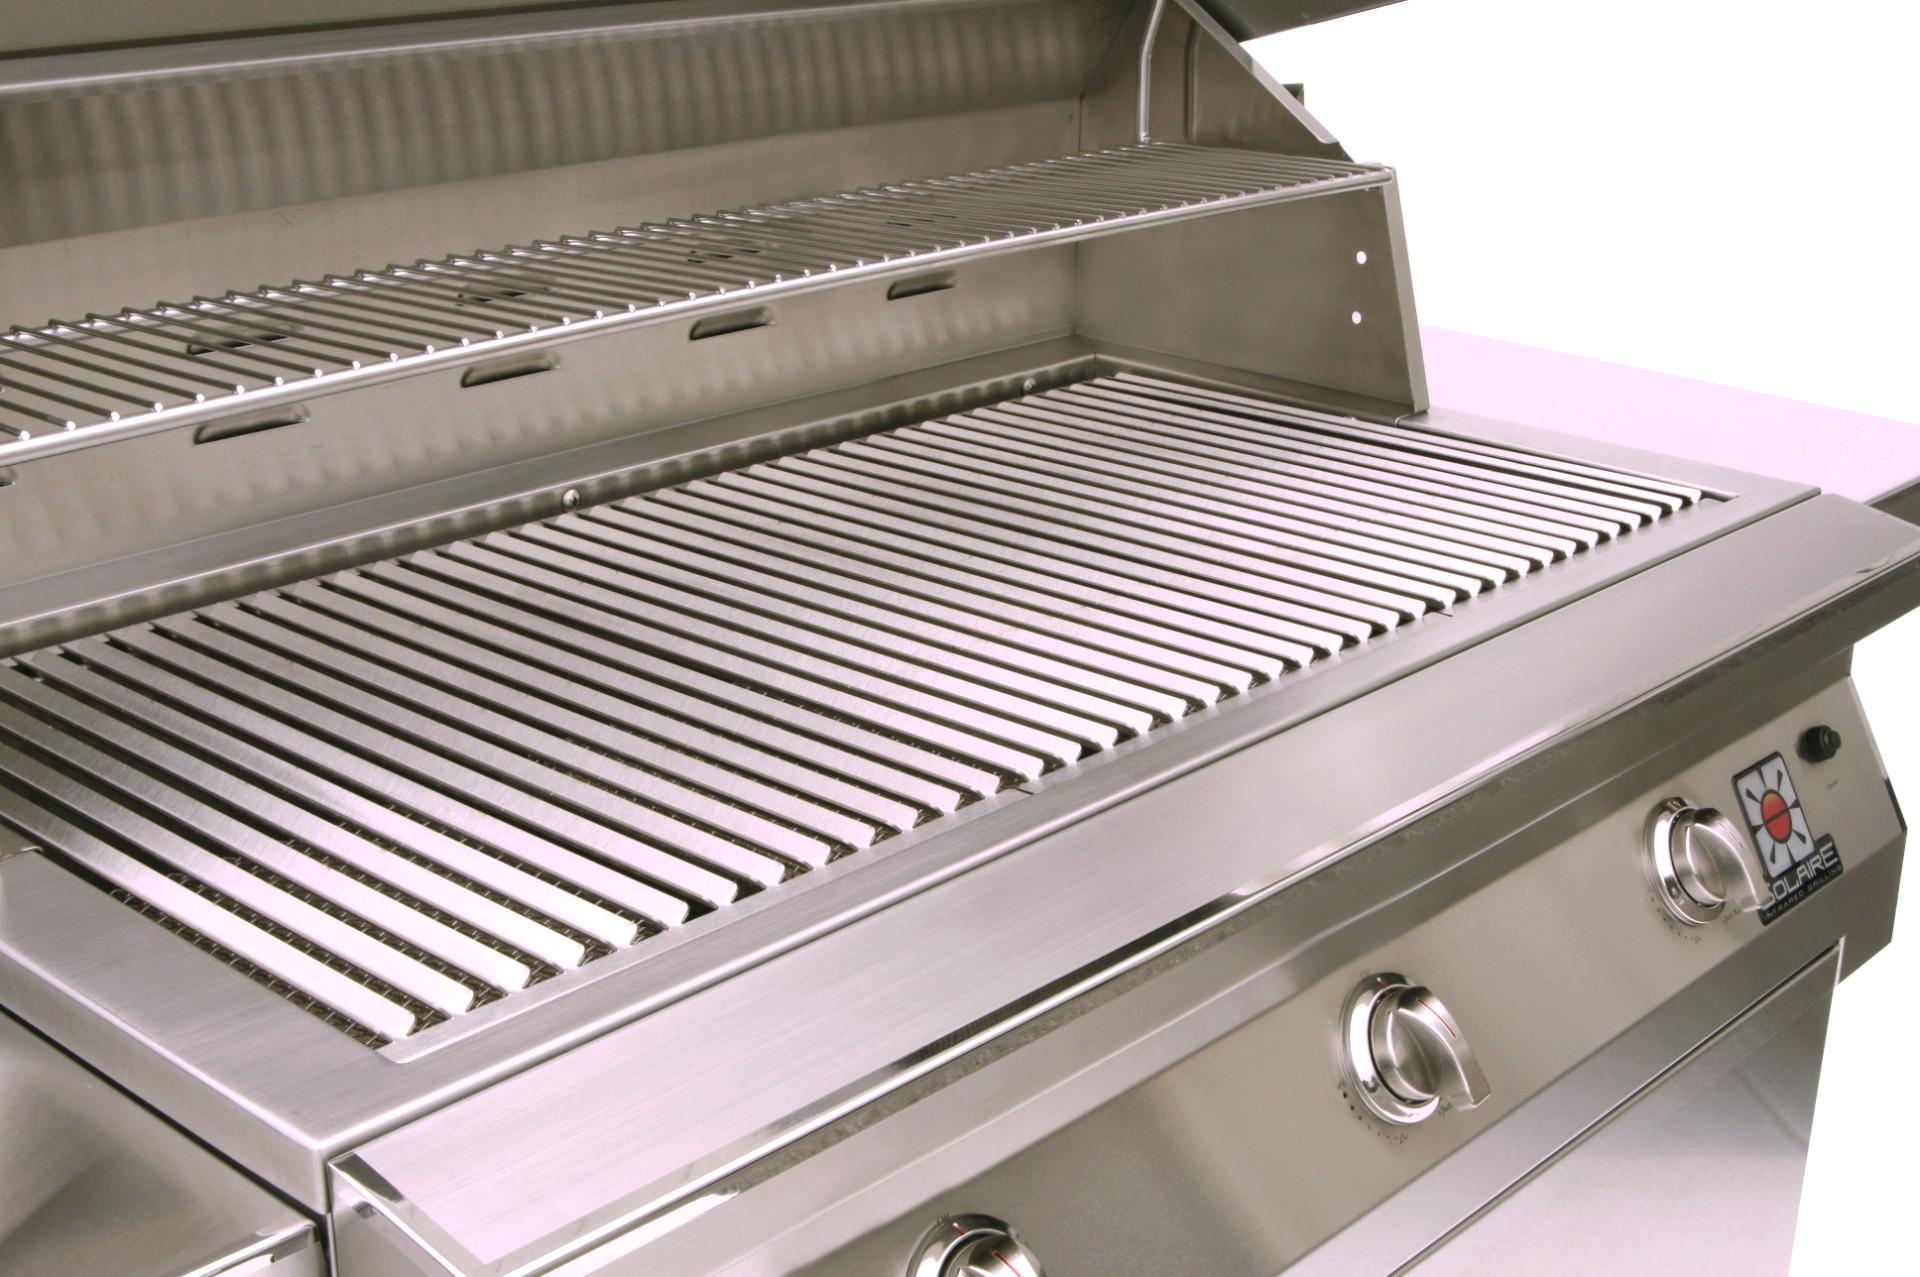 IRBQ-42C_detail-grate-warming-rack-logo_fl_1-r100-w1920